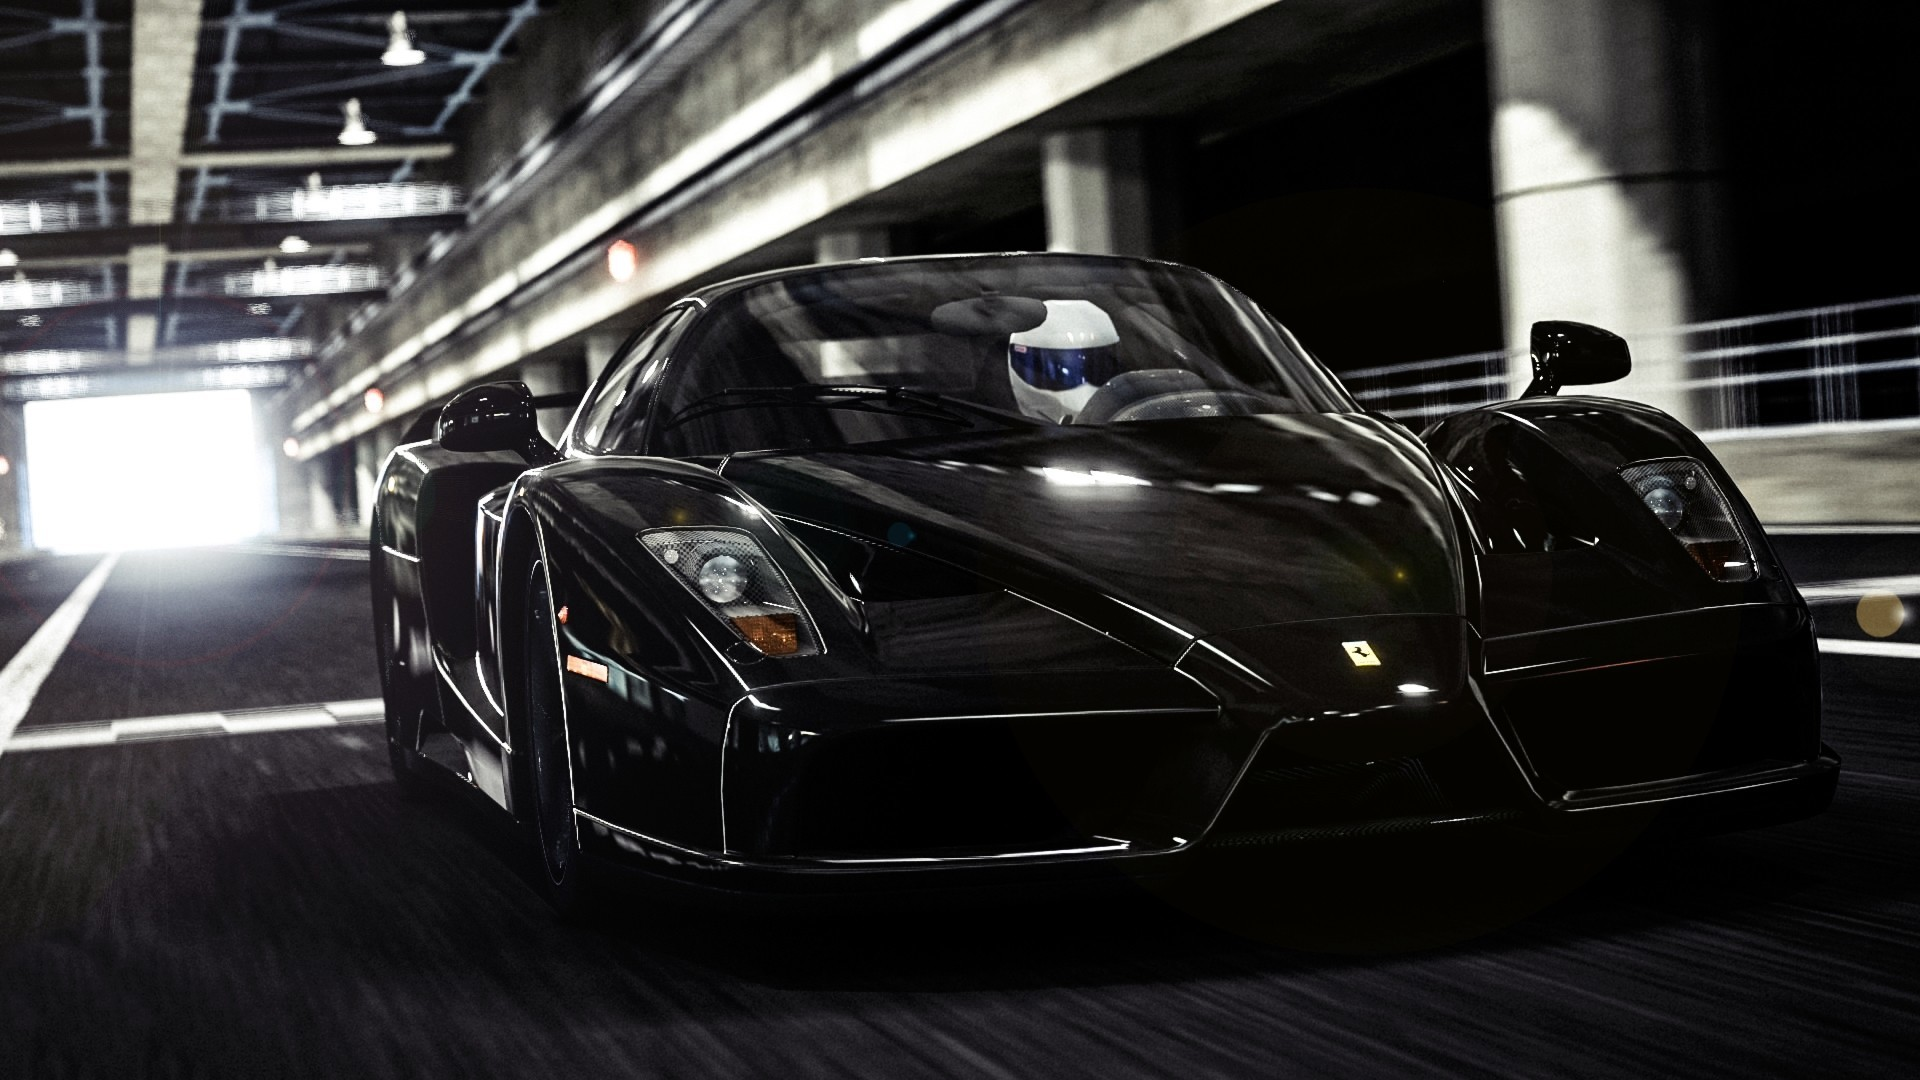 Ferrari Enzo 2018 Wallpaper (64+ pictures)